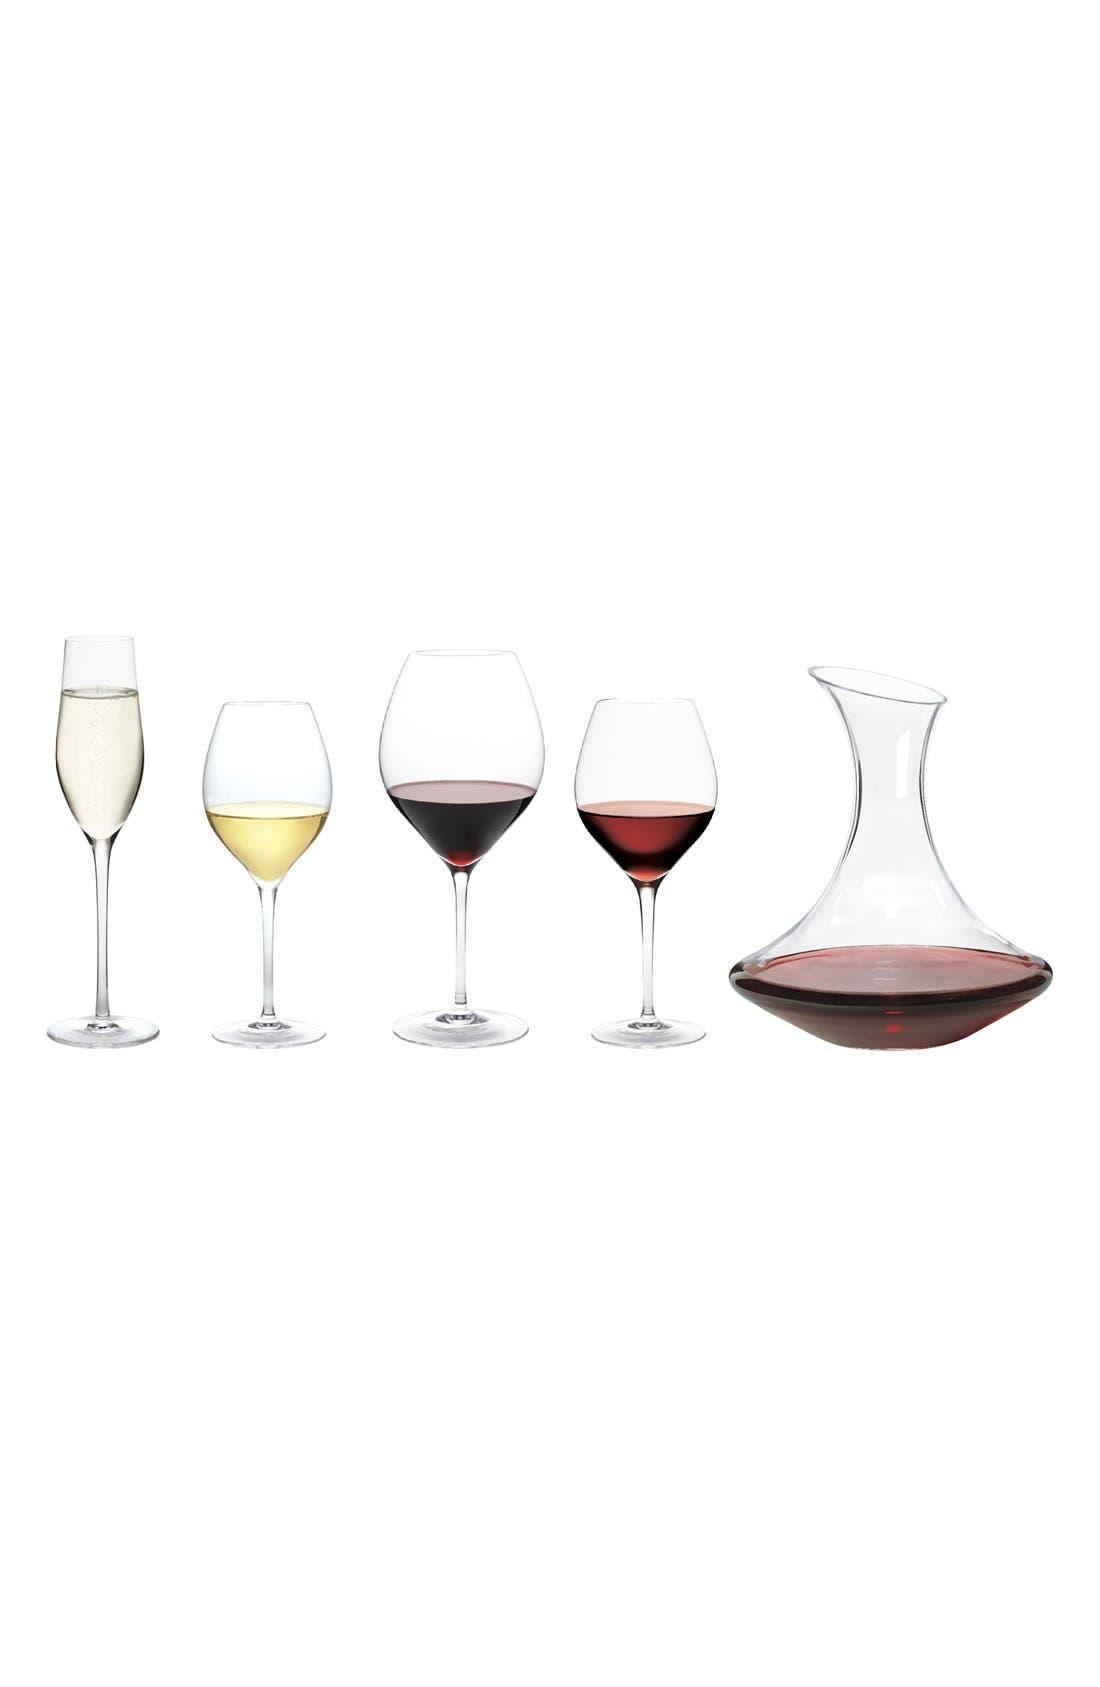 NORDSTROM AT HOME,                             Ravenna Set of 4 Red Wine Glasses,                             Alternate thumbnail 2, color,                             960